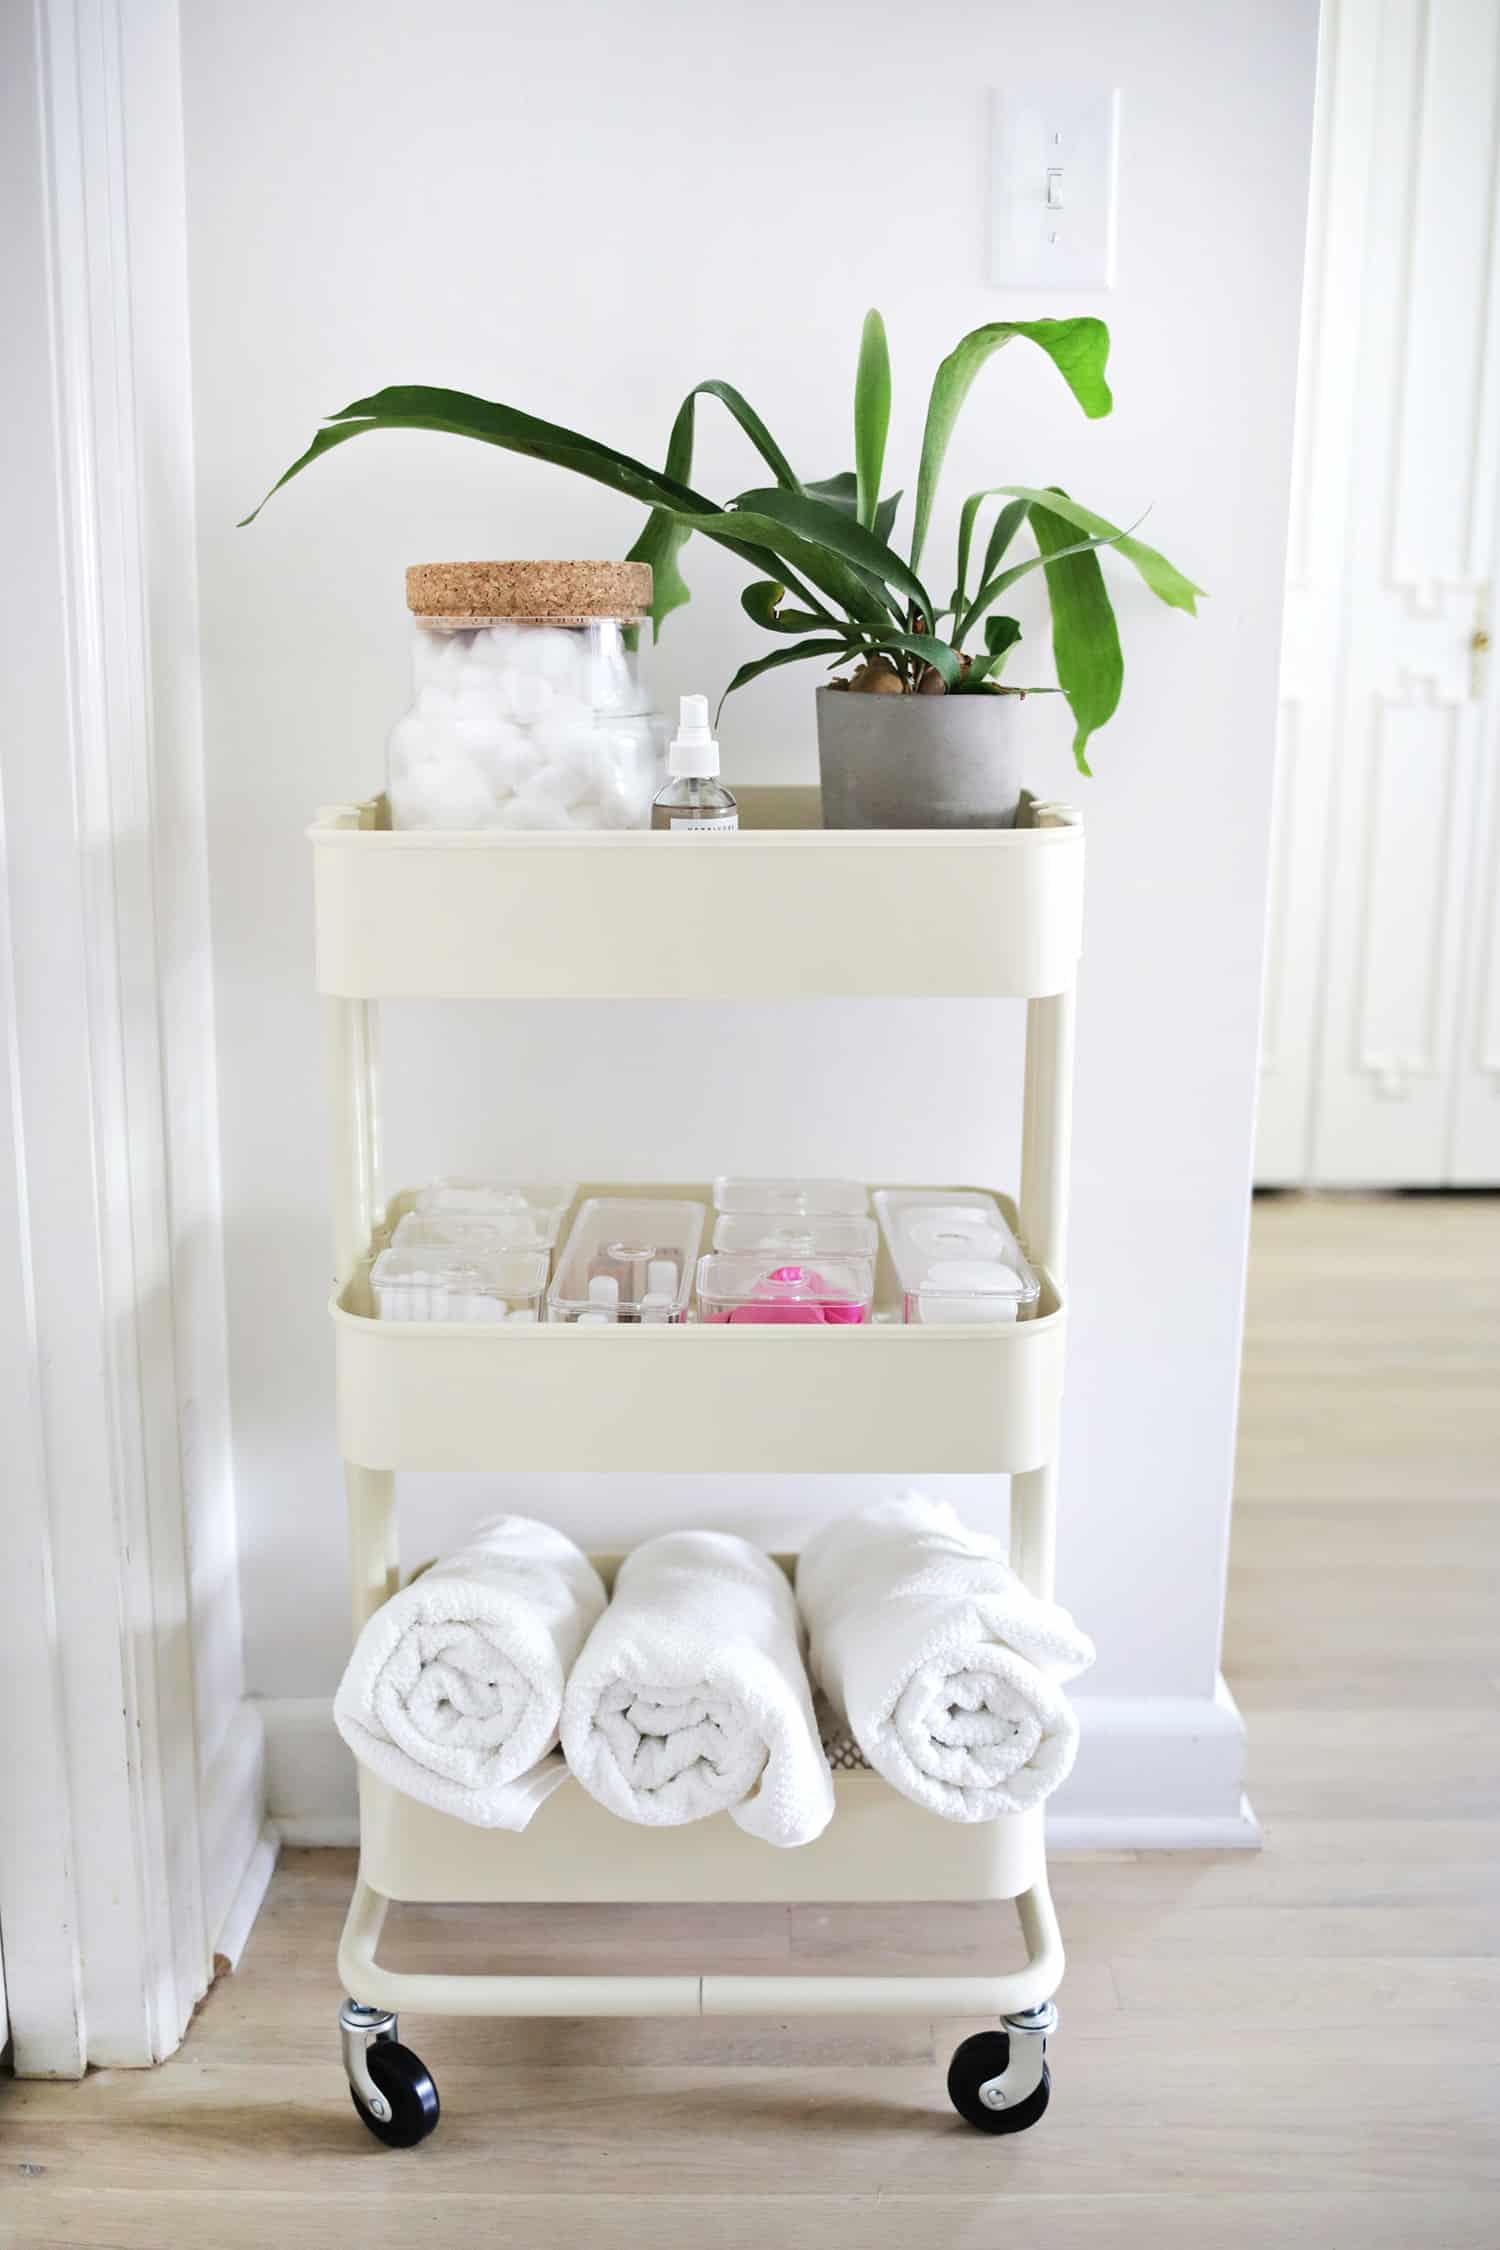 small-bathroom-ideas-ikea-storage-cart